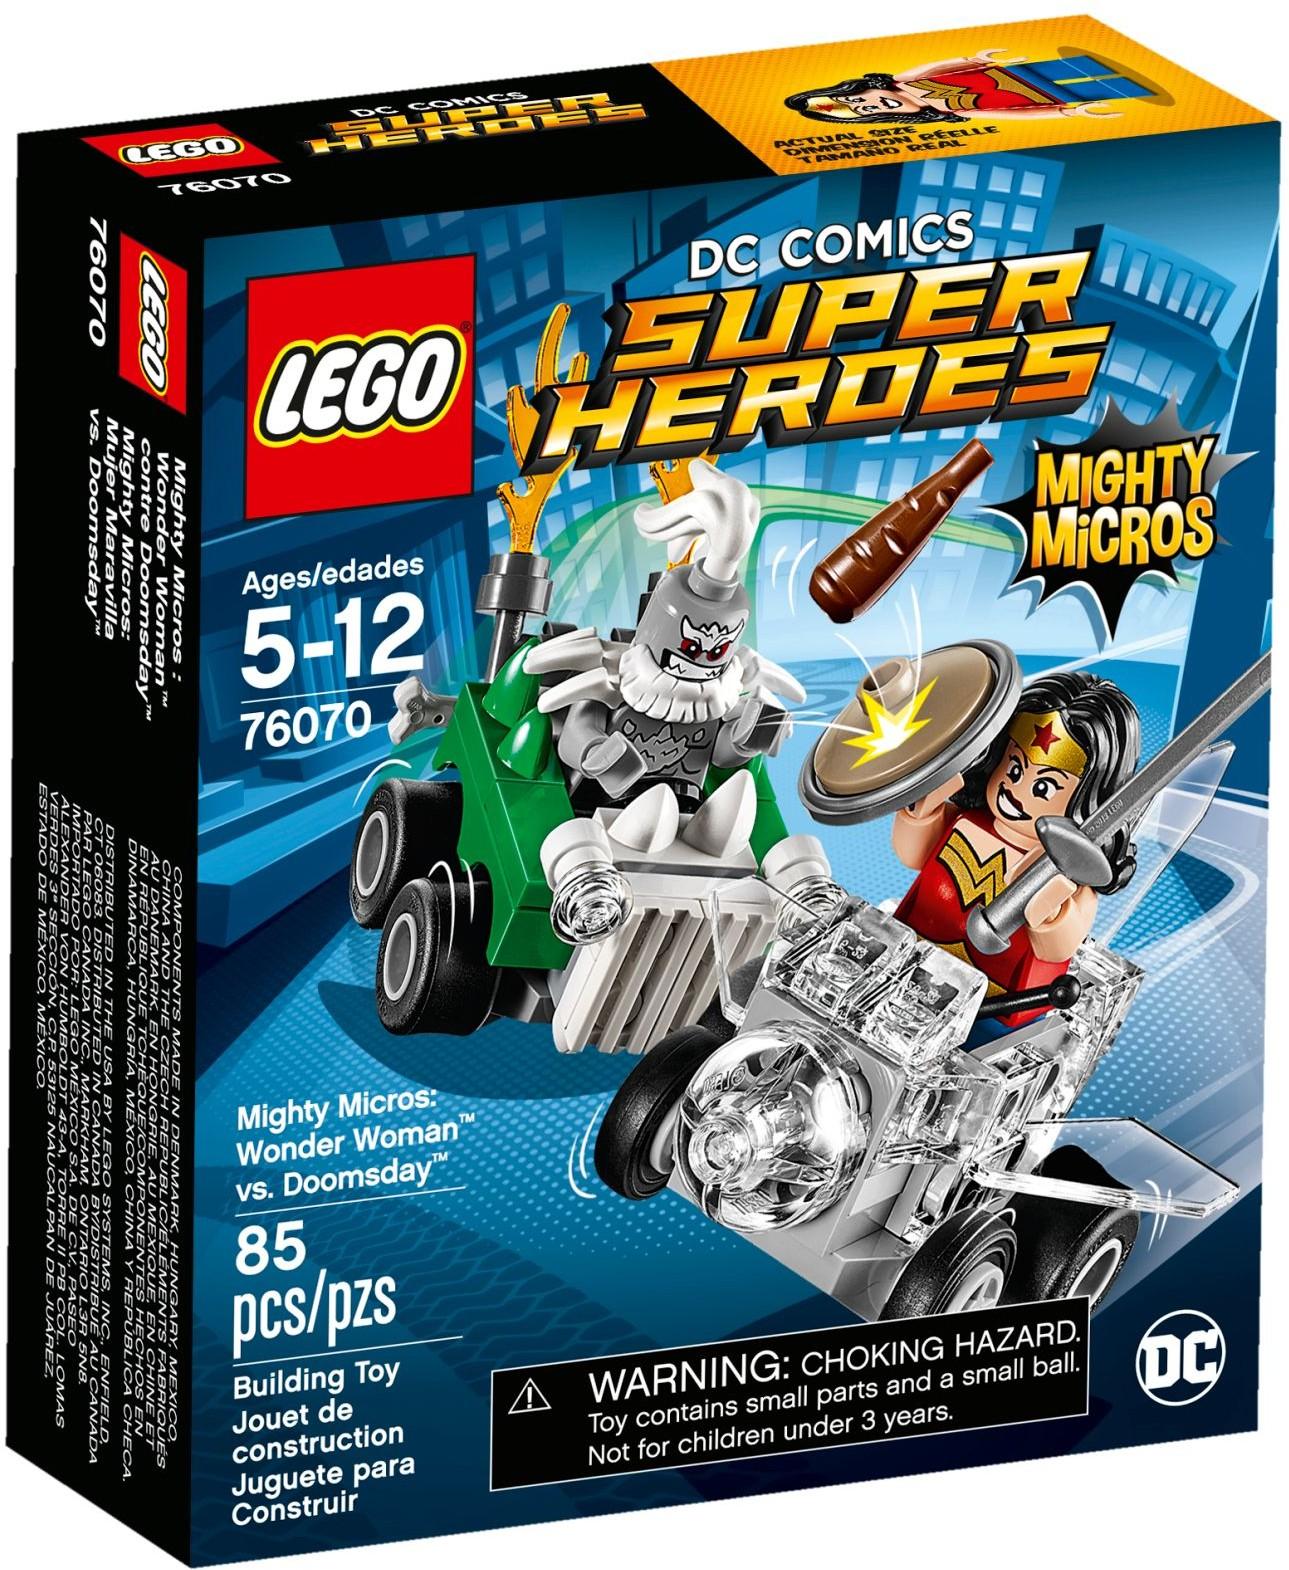 76070 Mighty Micros: Wonder Woman vs. Doomsday